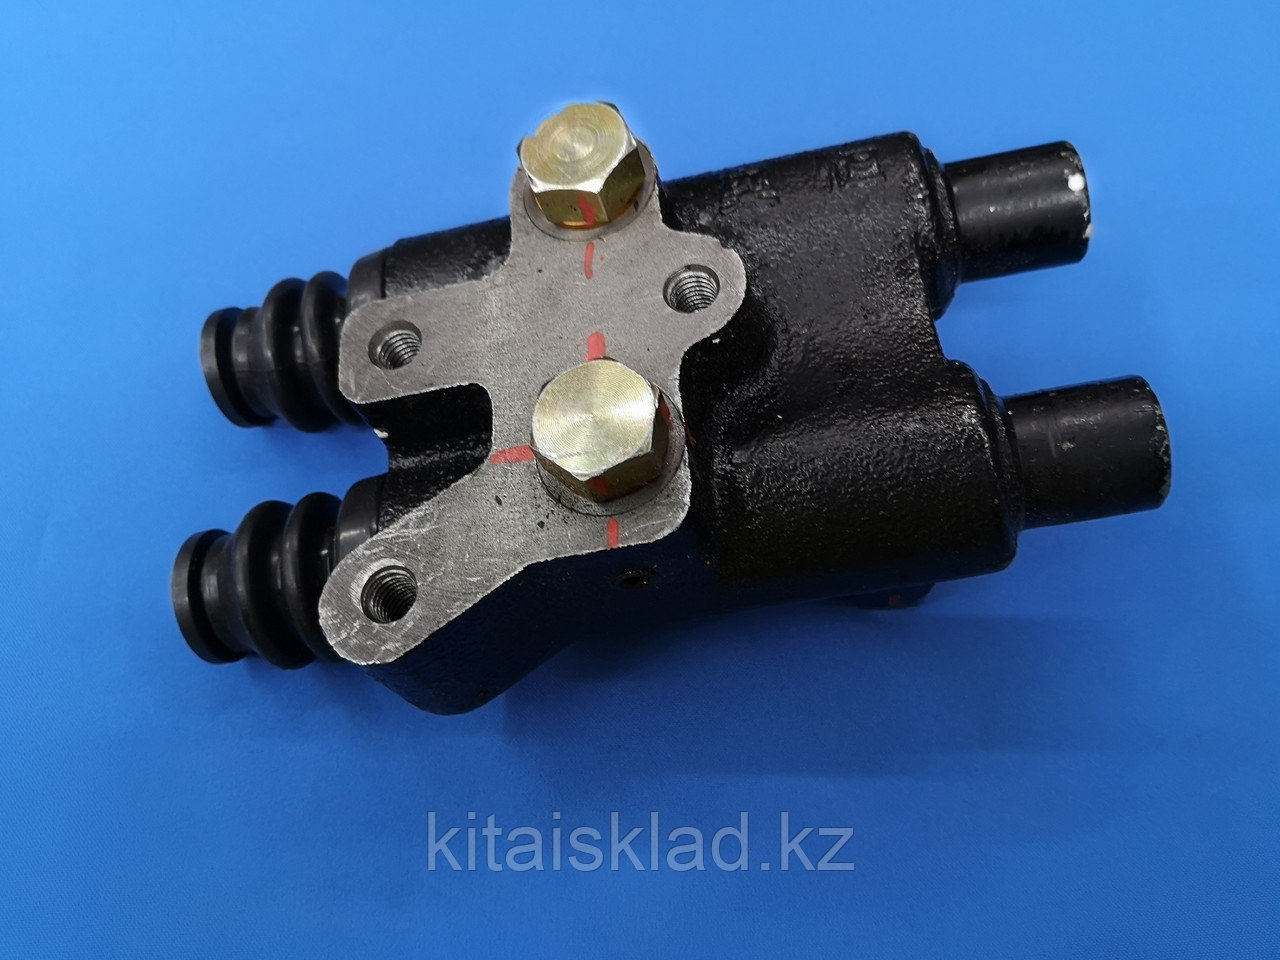 FT800A.43C.017 тормозной цилиндр Foton TD804 824 1024